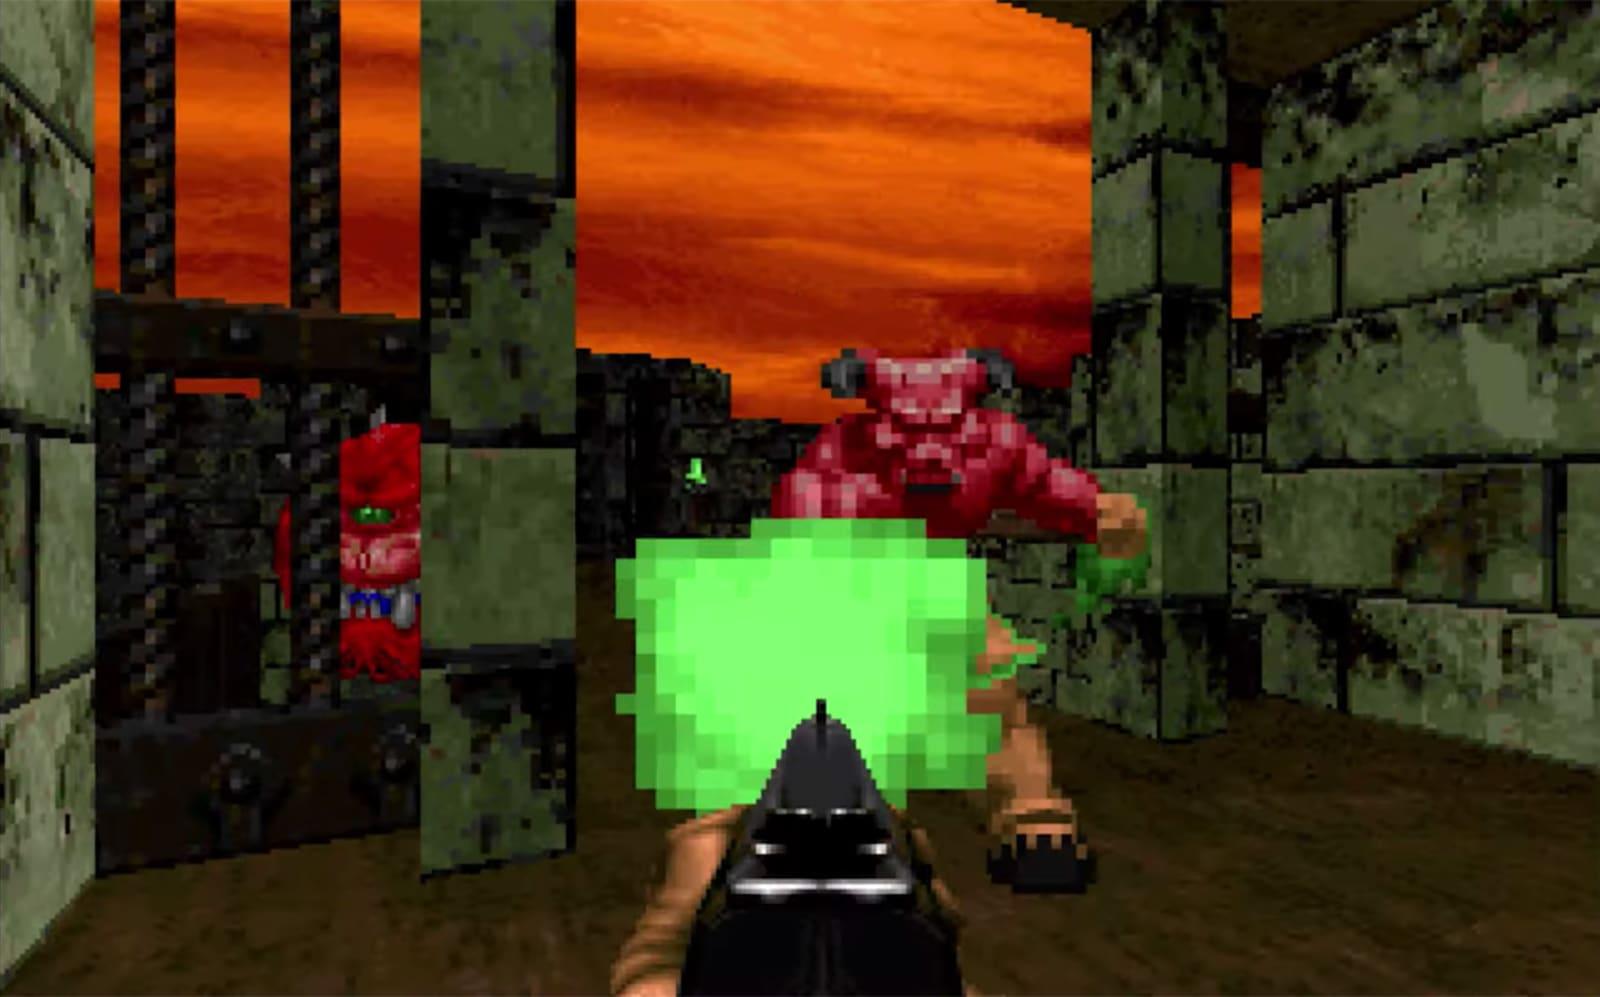 Bethesda's 'Doom' re-releases will no longer need internet